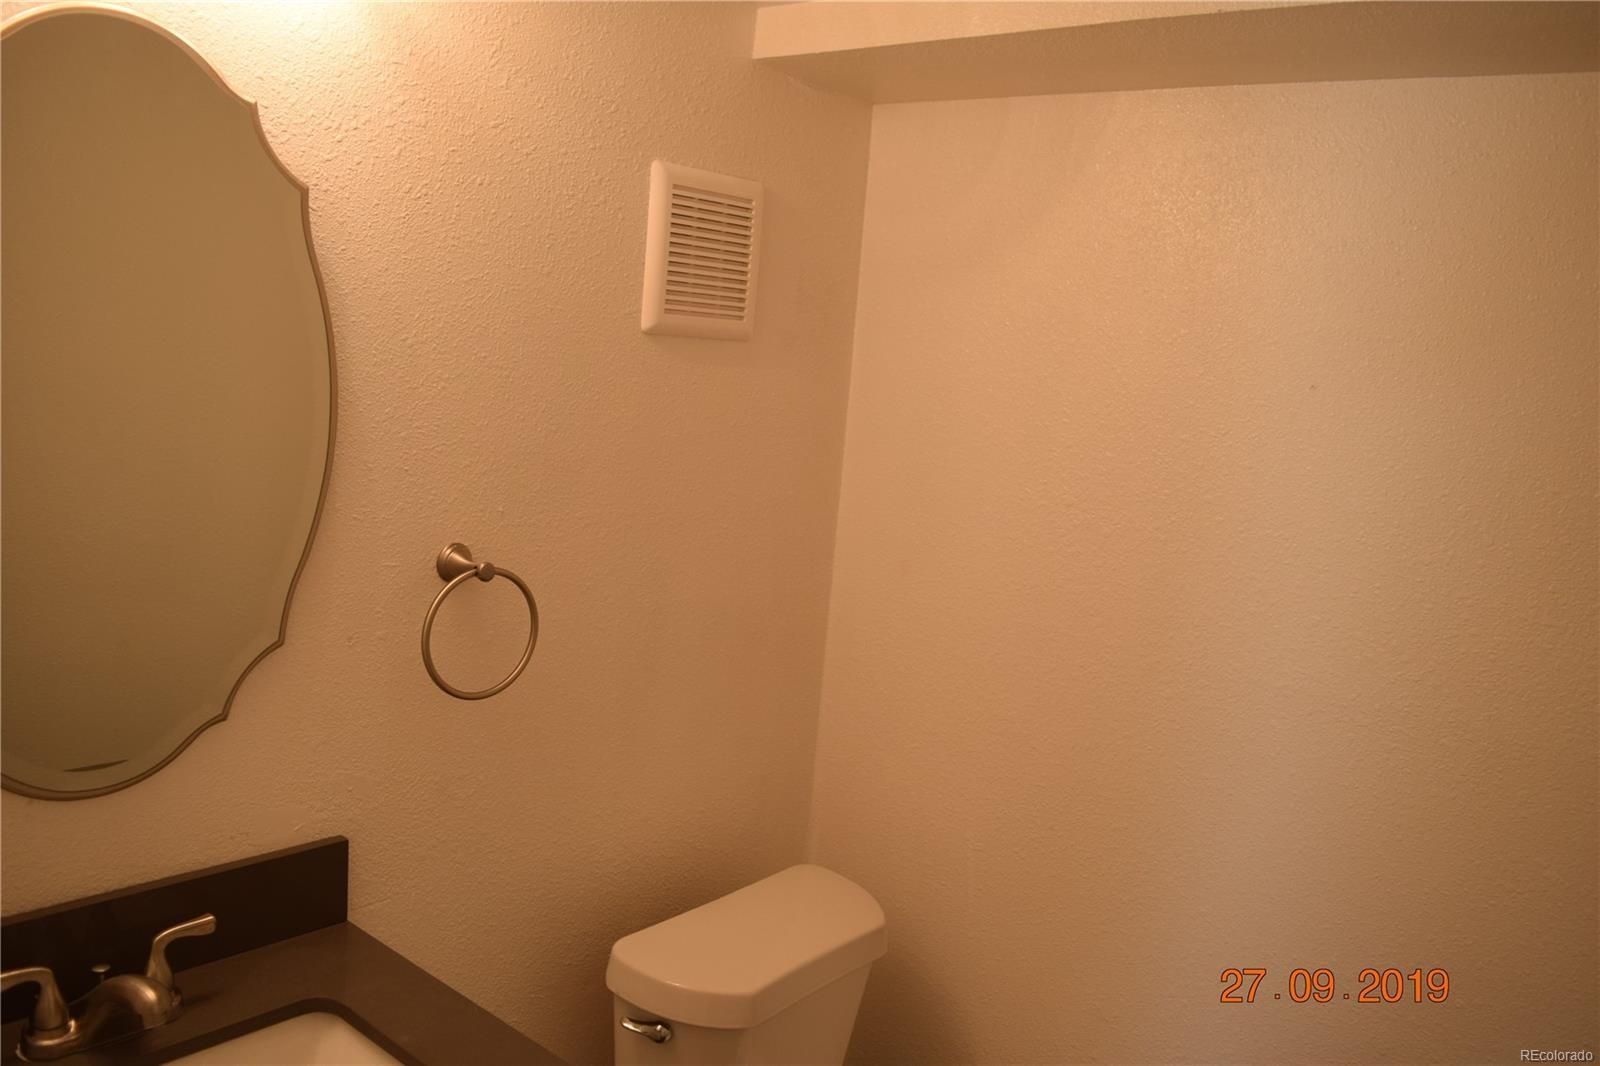 MLS# 9616472 - 18 - 8026 W Calhoun Place, Littleton, CO 80123